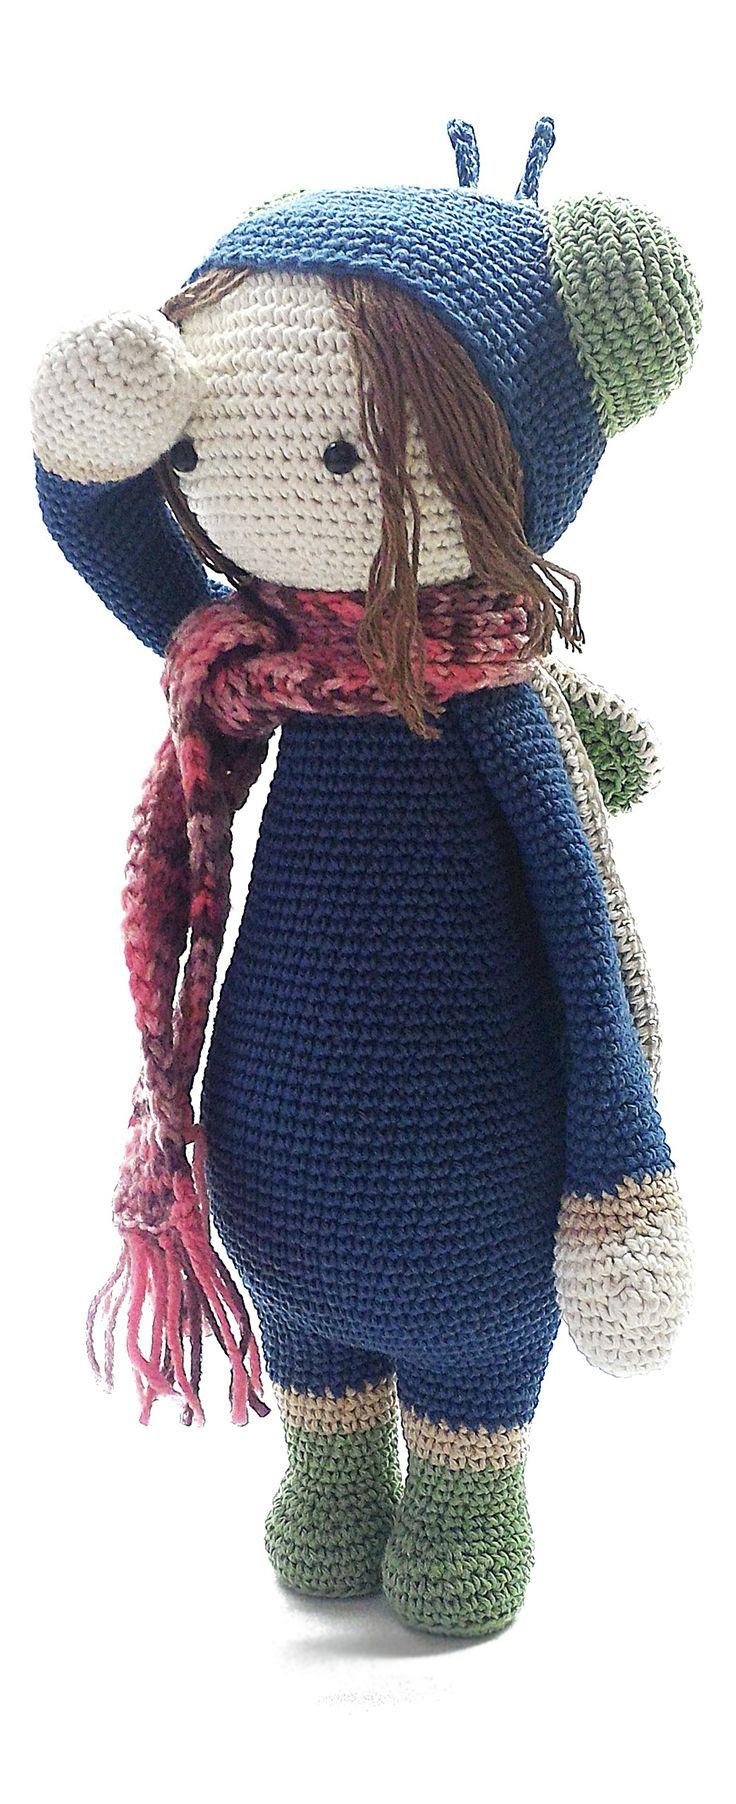 #amigurumi #toys #lalylala #dolls #crochetdoll #buzz #crochettoys #cute #interiortoy #амигуруми #игрушка #кукла #интерьернаякукла